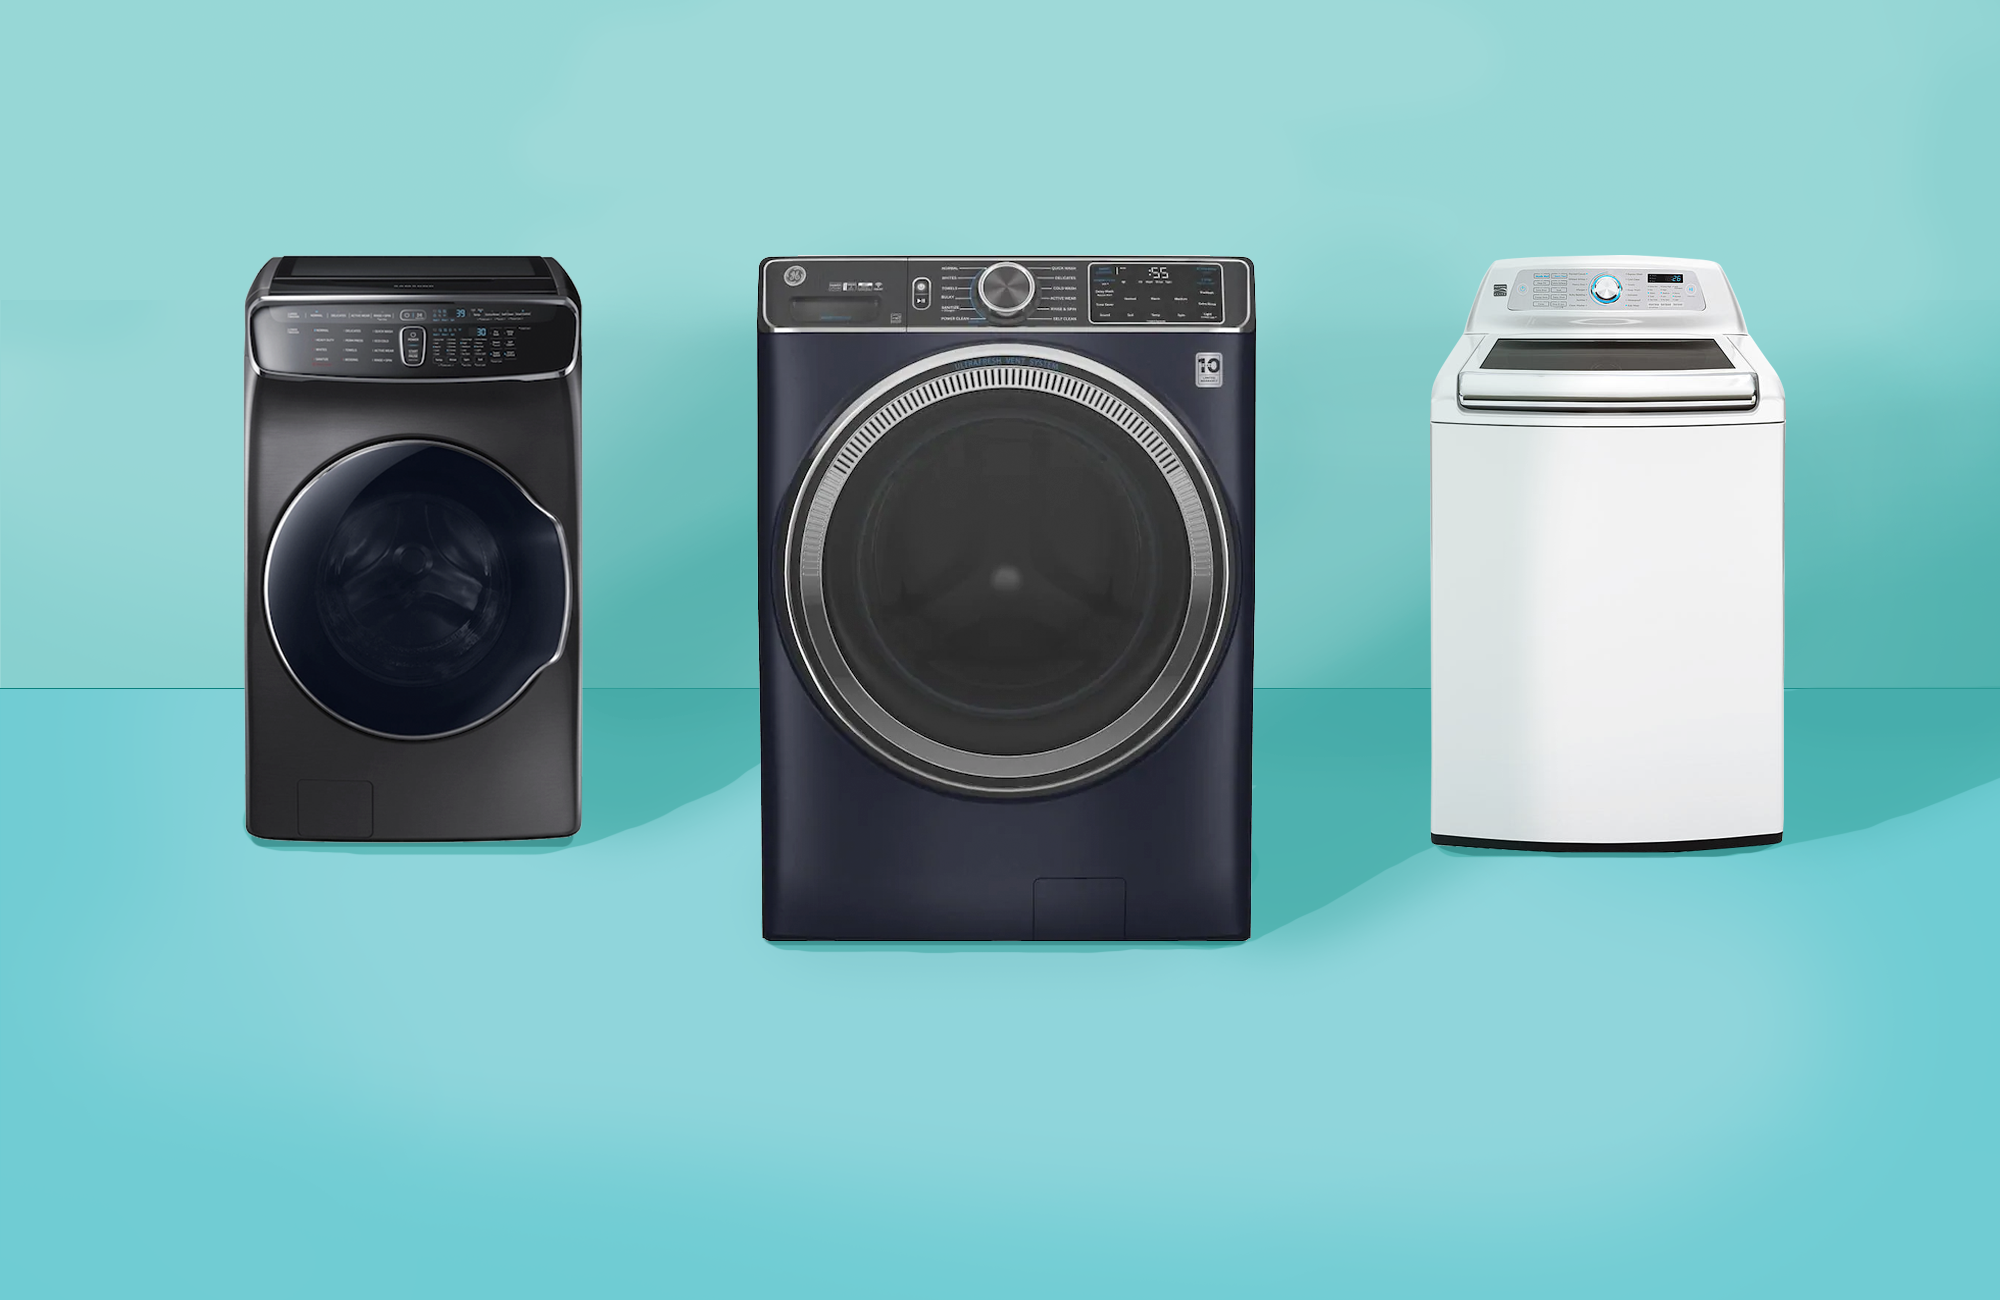 8 Best Washing Machines of 2020 - Top Washing Machine Reviews